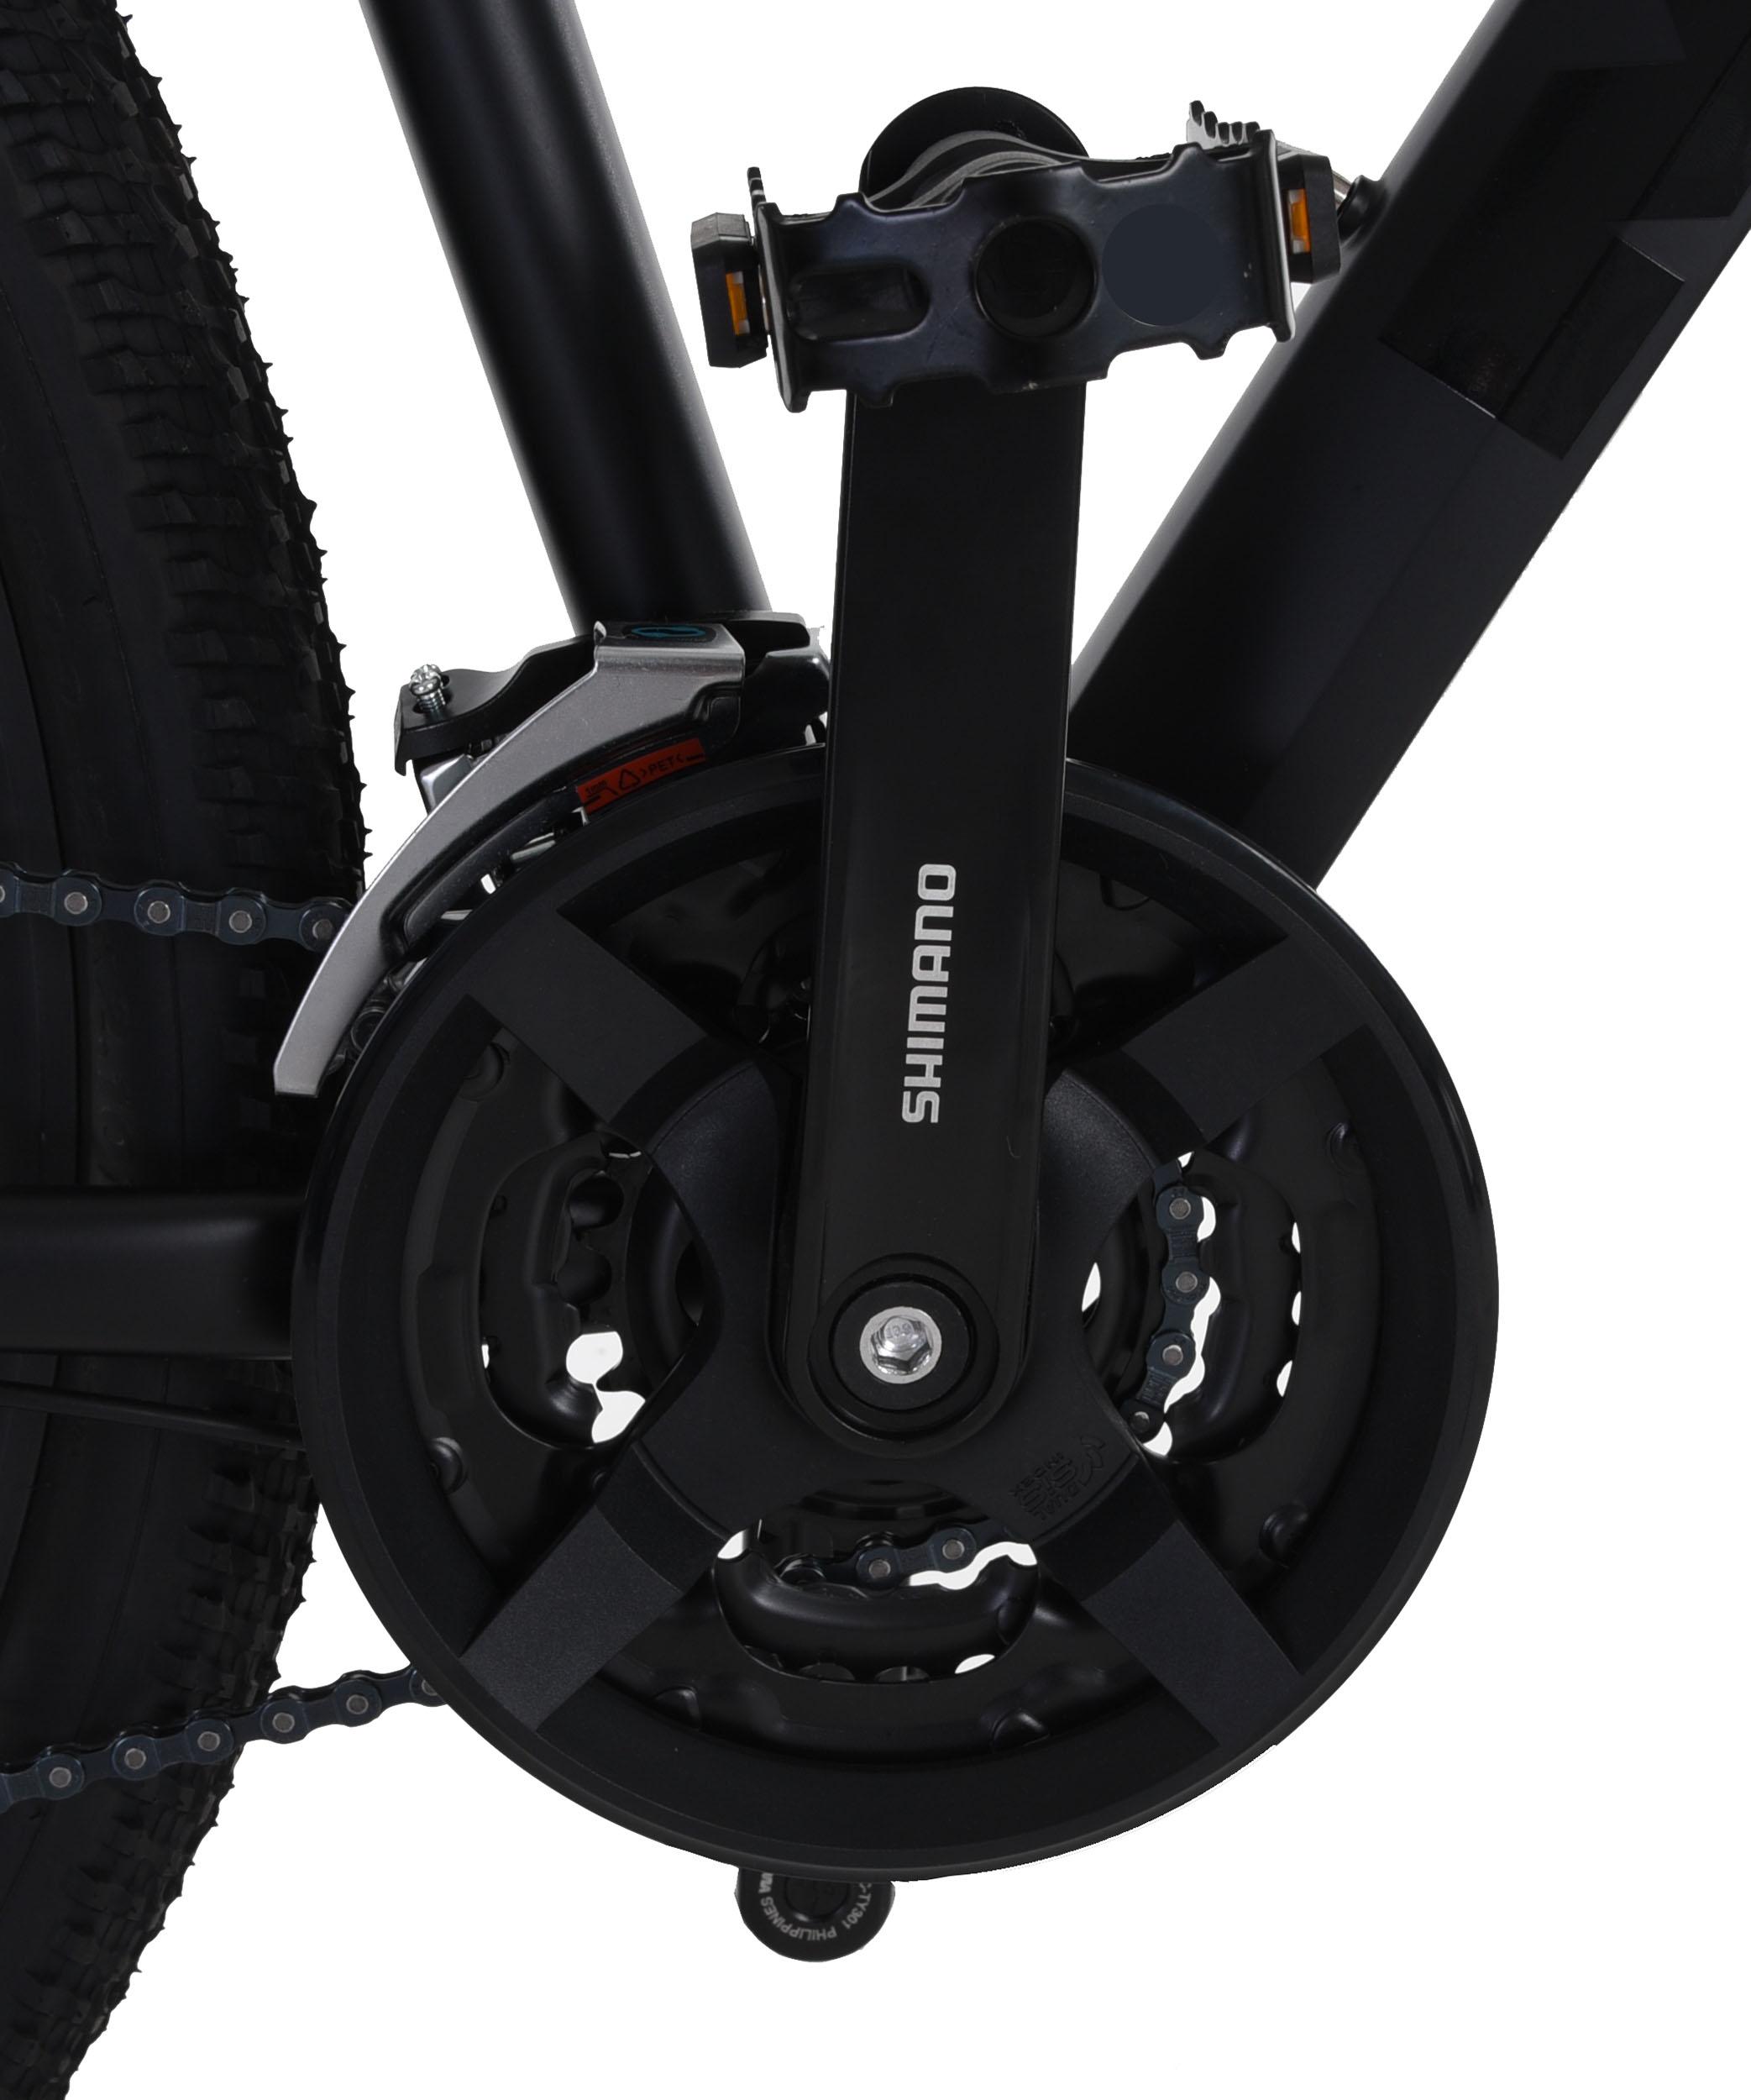 thumbnail 16 - COBRA 29er Mountain Bike 24 Speed MTB with 29-Inch Wheels